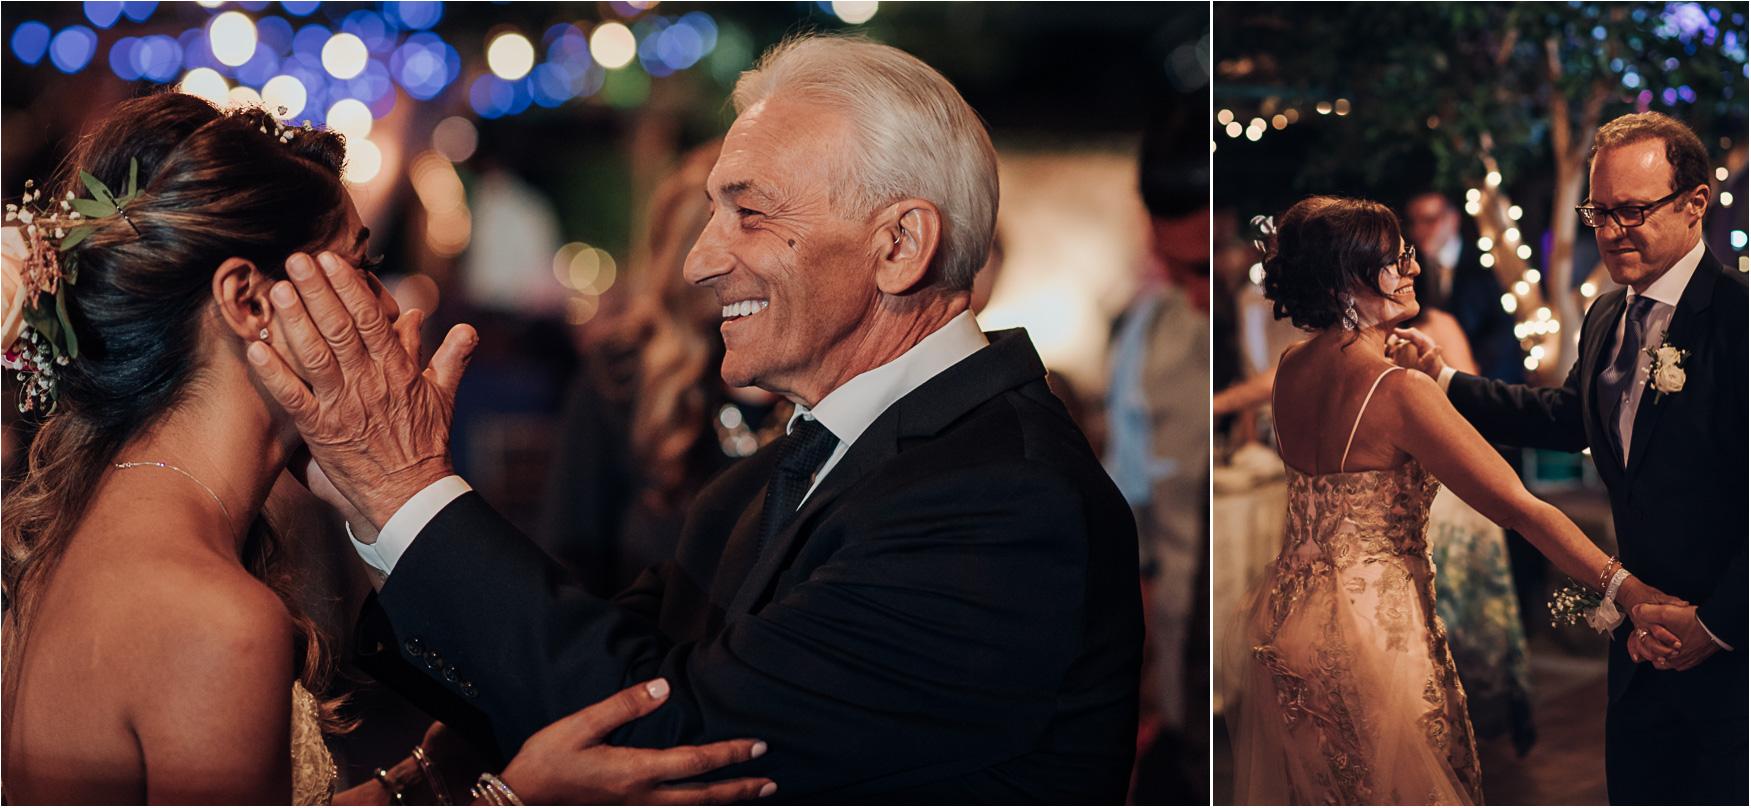 Dancing during Madsen's Greenhouse wedding reception